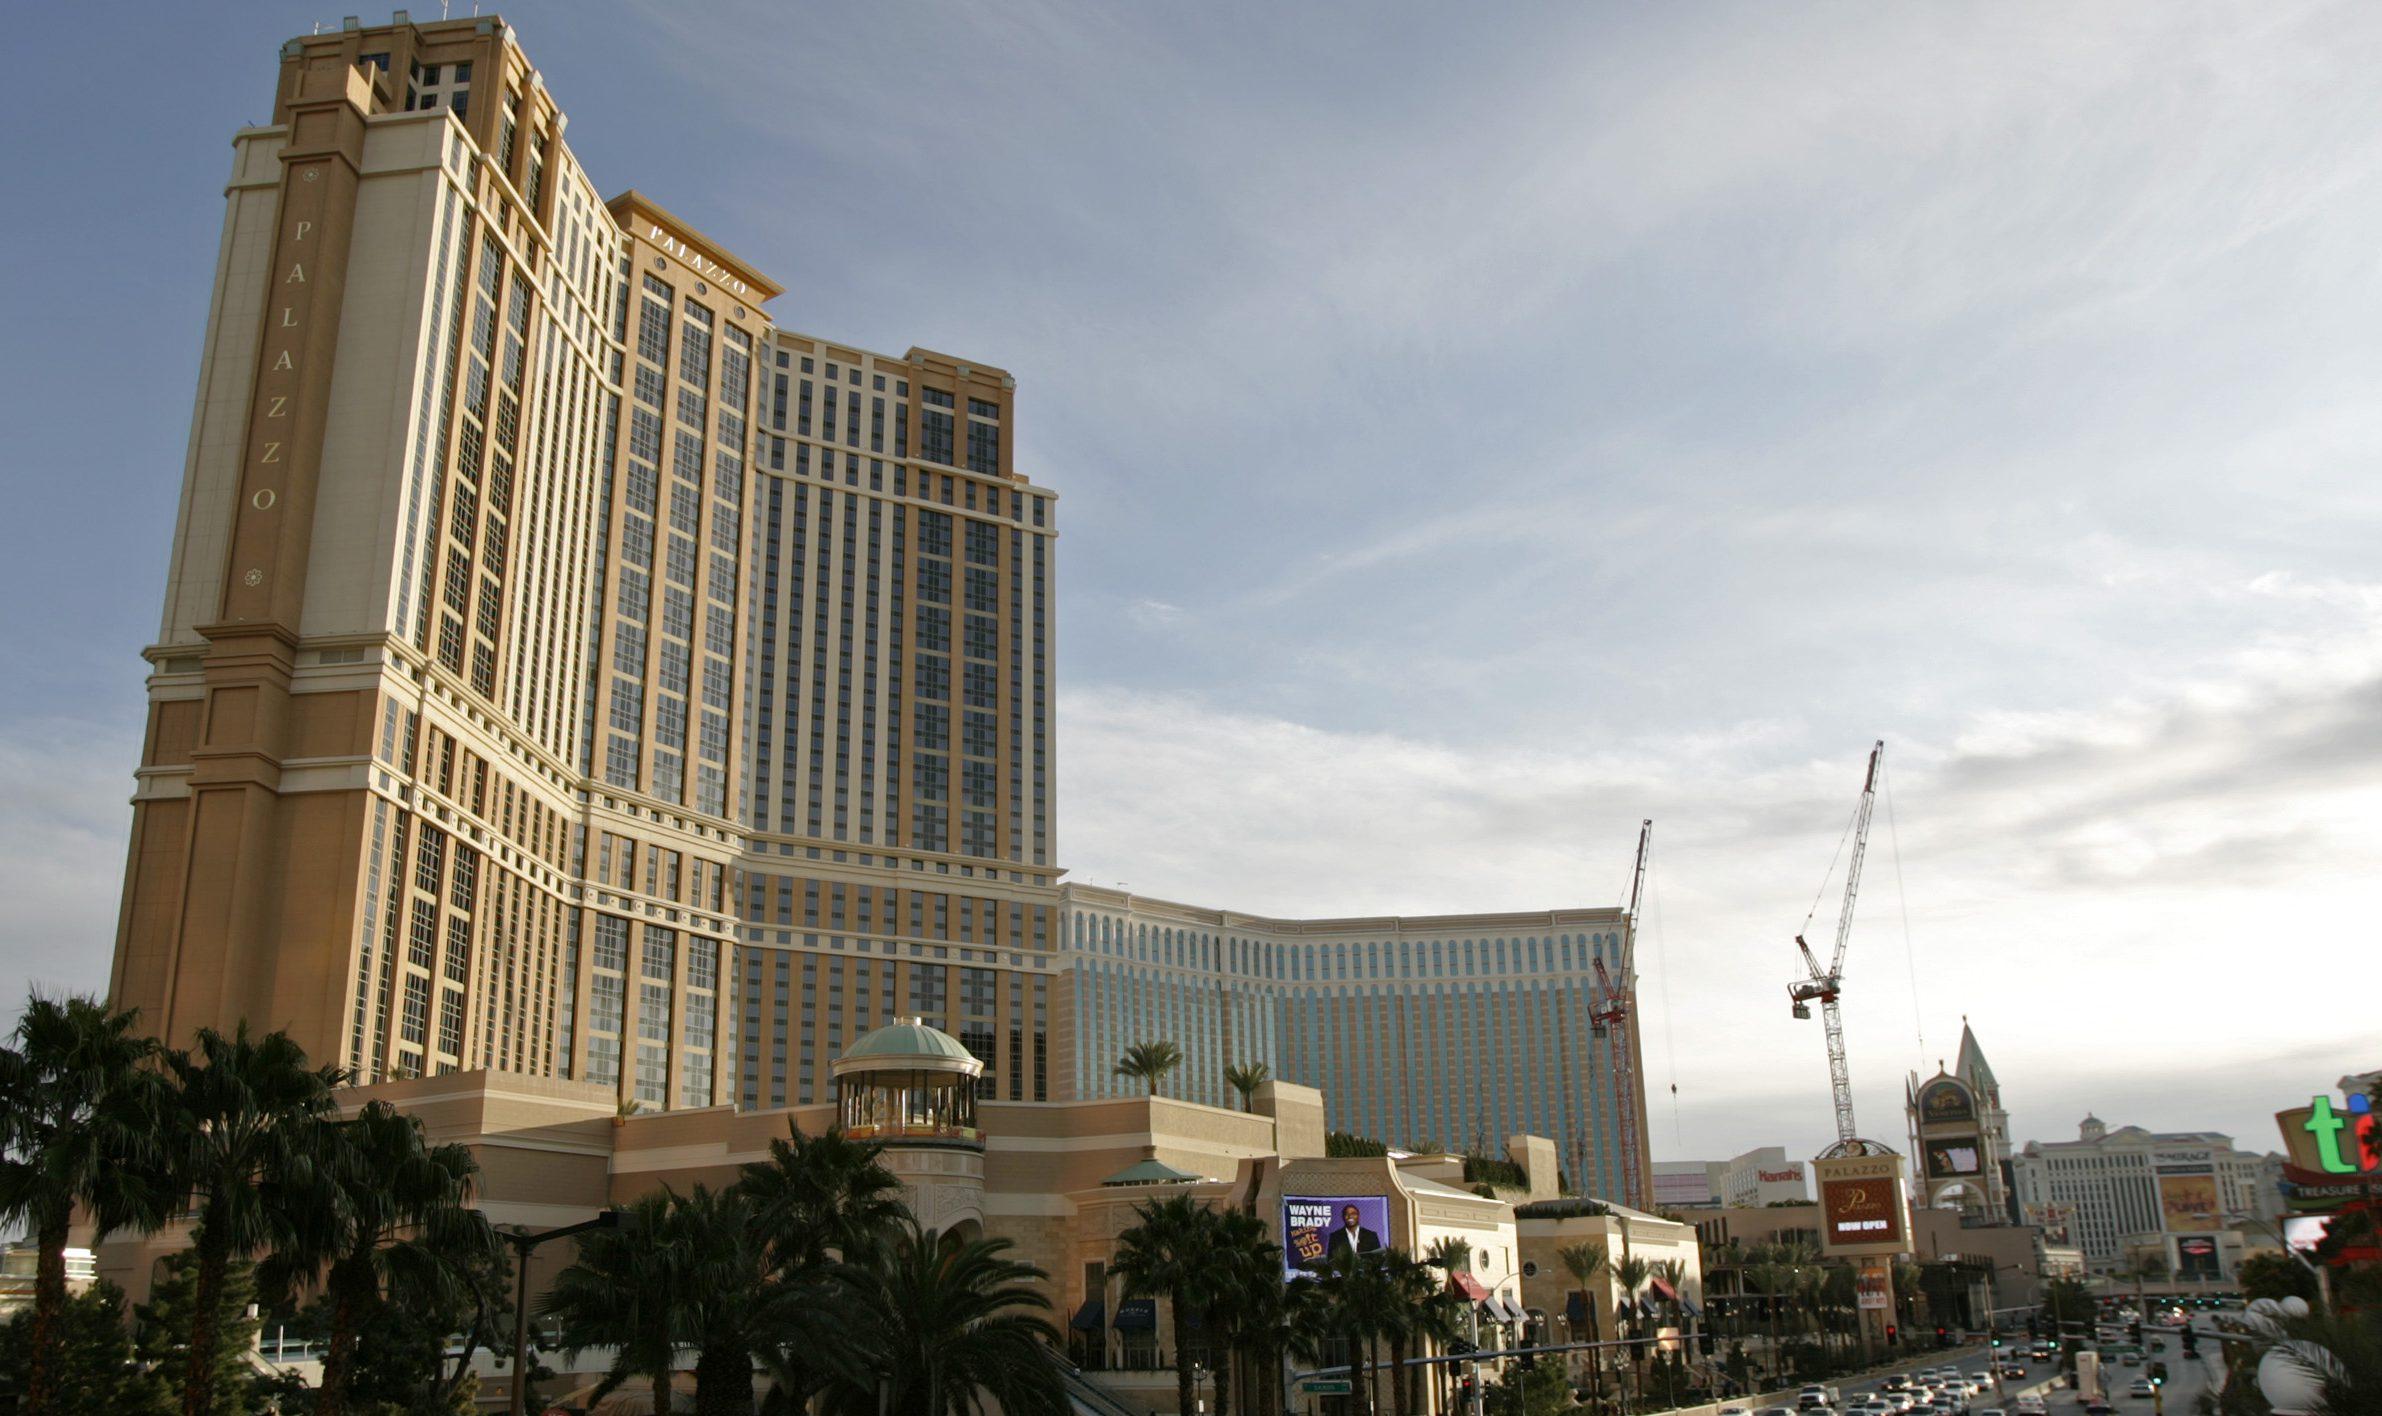 Las Vegas Sands Palazzo